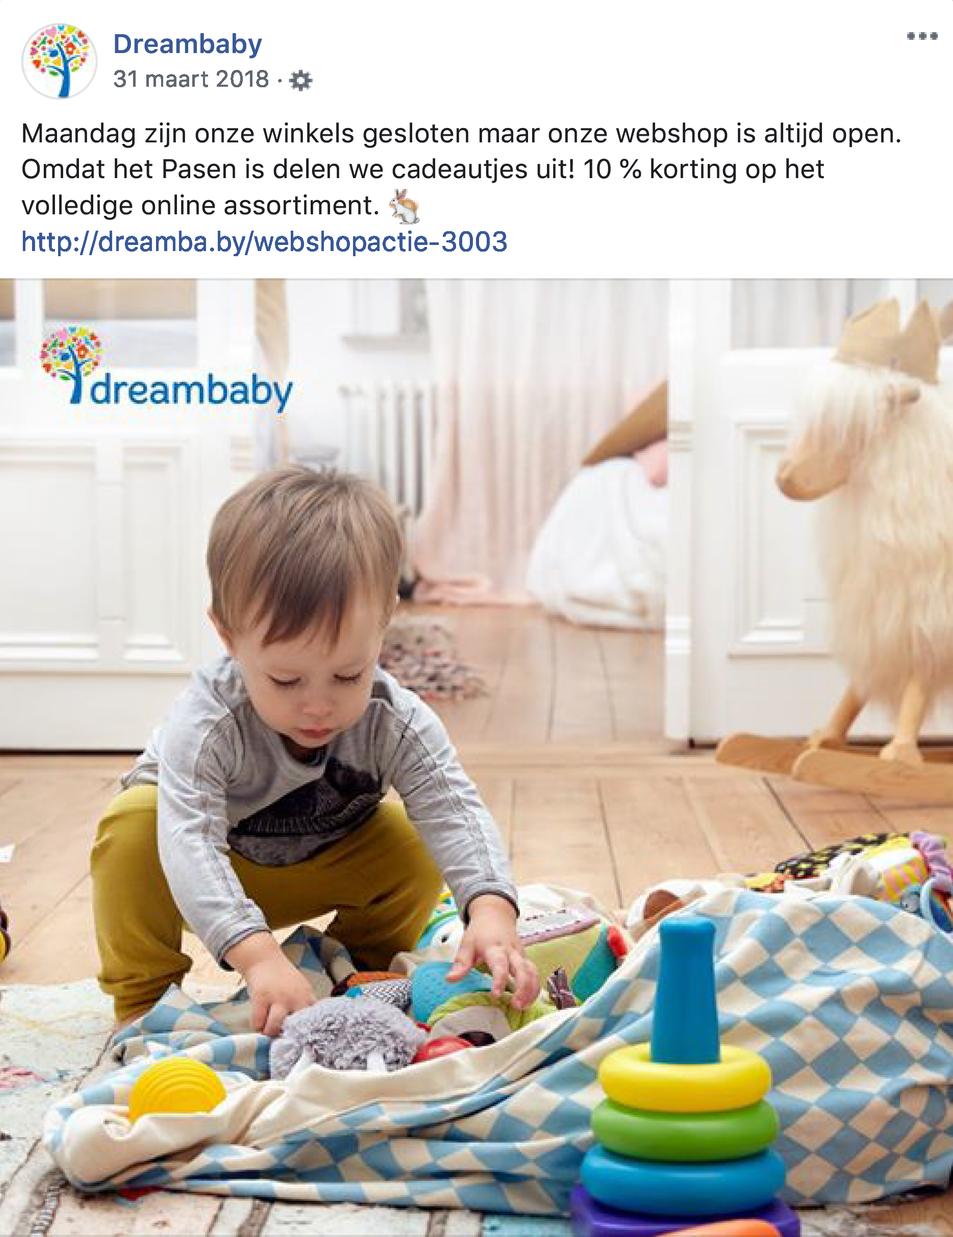 FB-dreambaby-02.png